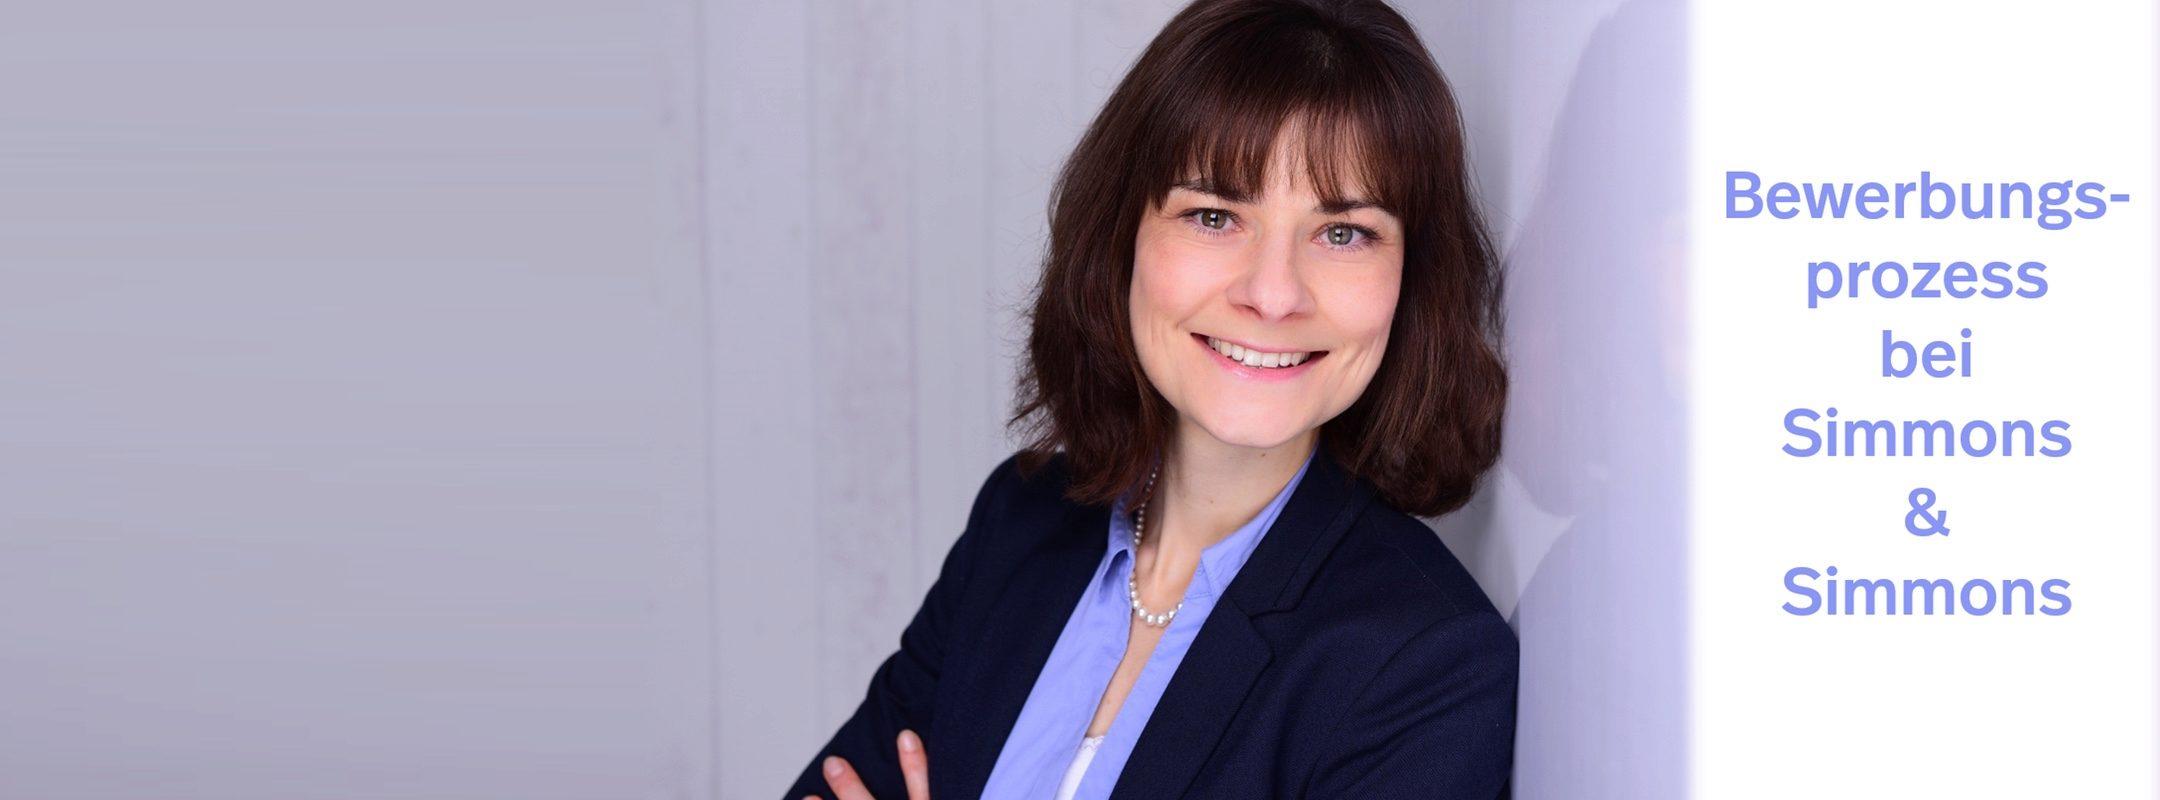 Carolin Carstens Simmons und Simmons HR